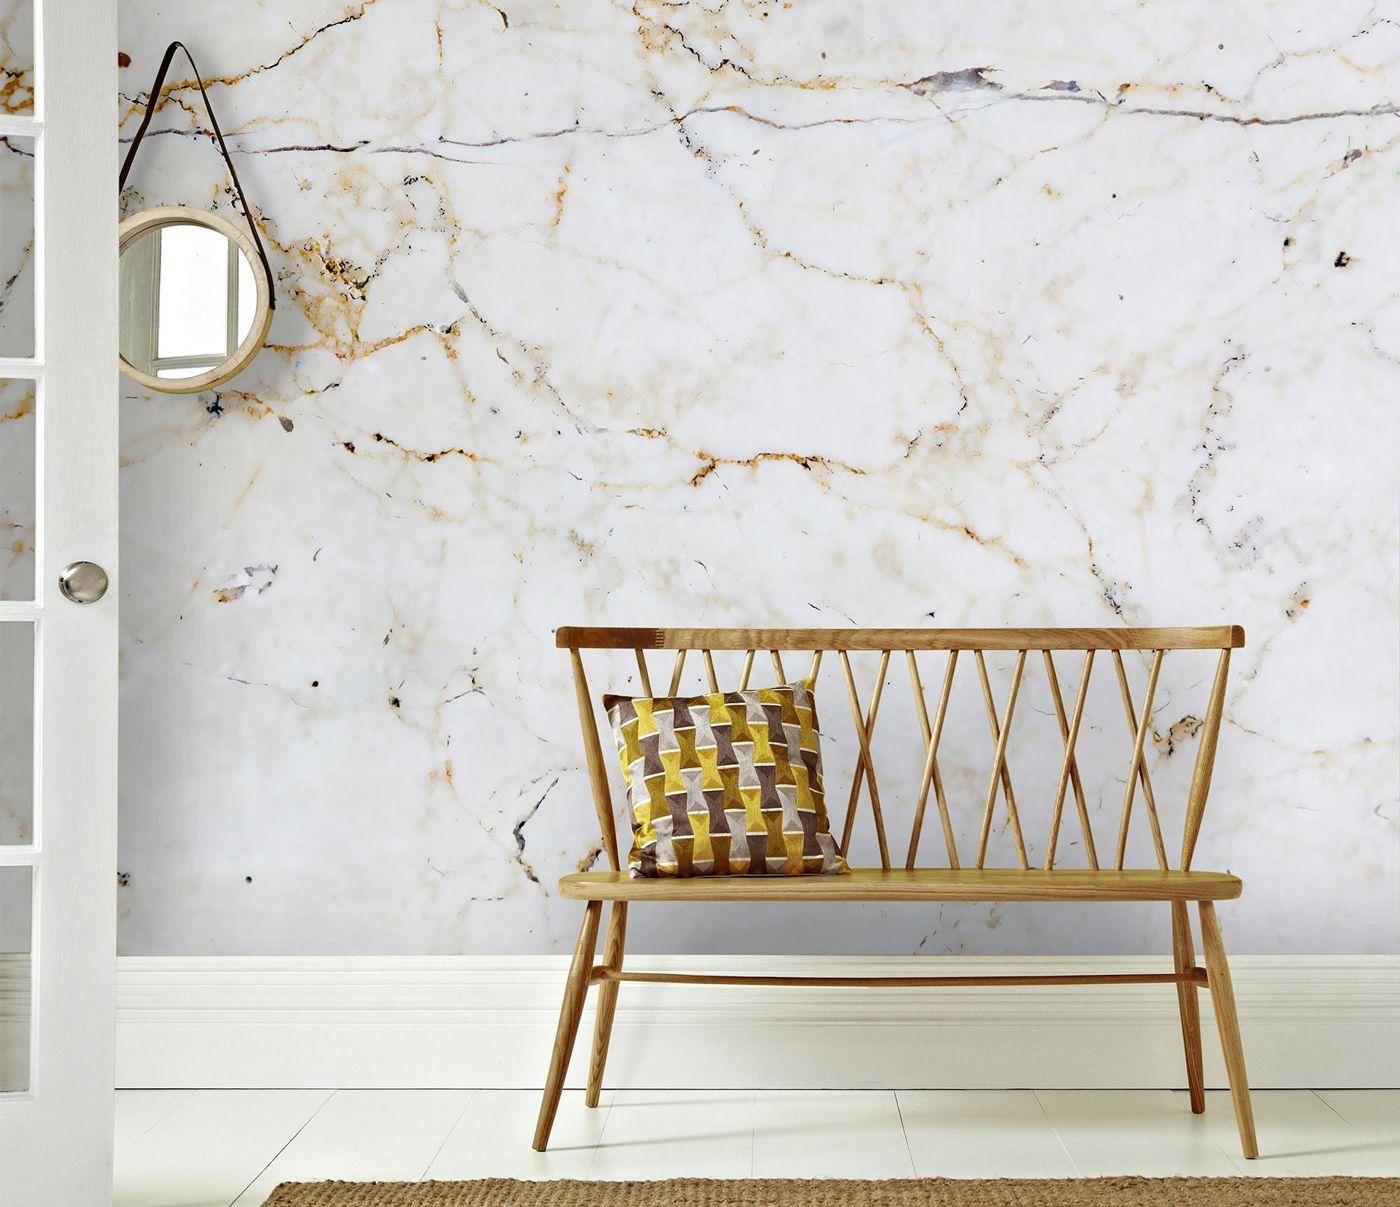 behang #muurdecoratie #woonkamer #slaapkamer #marmer #interieur ...